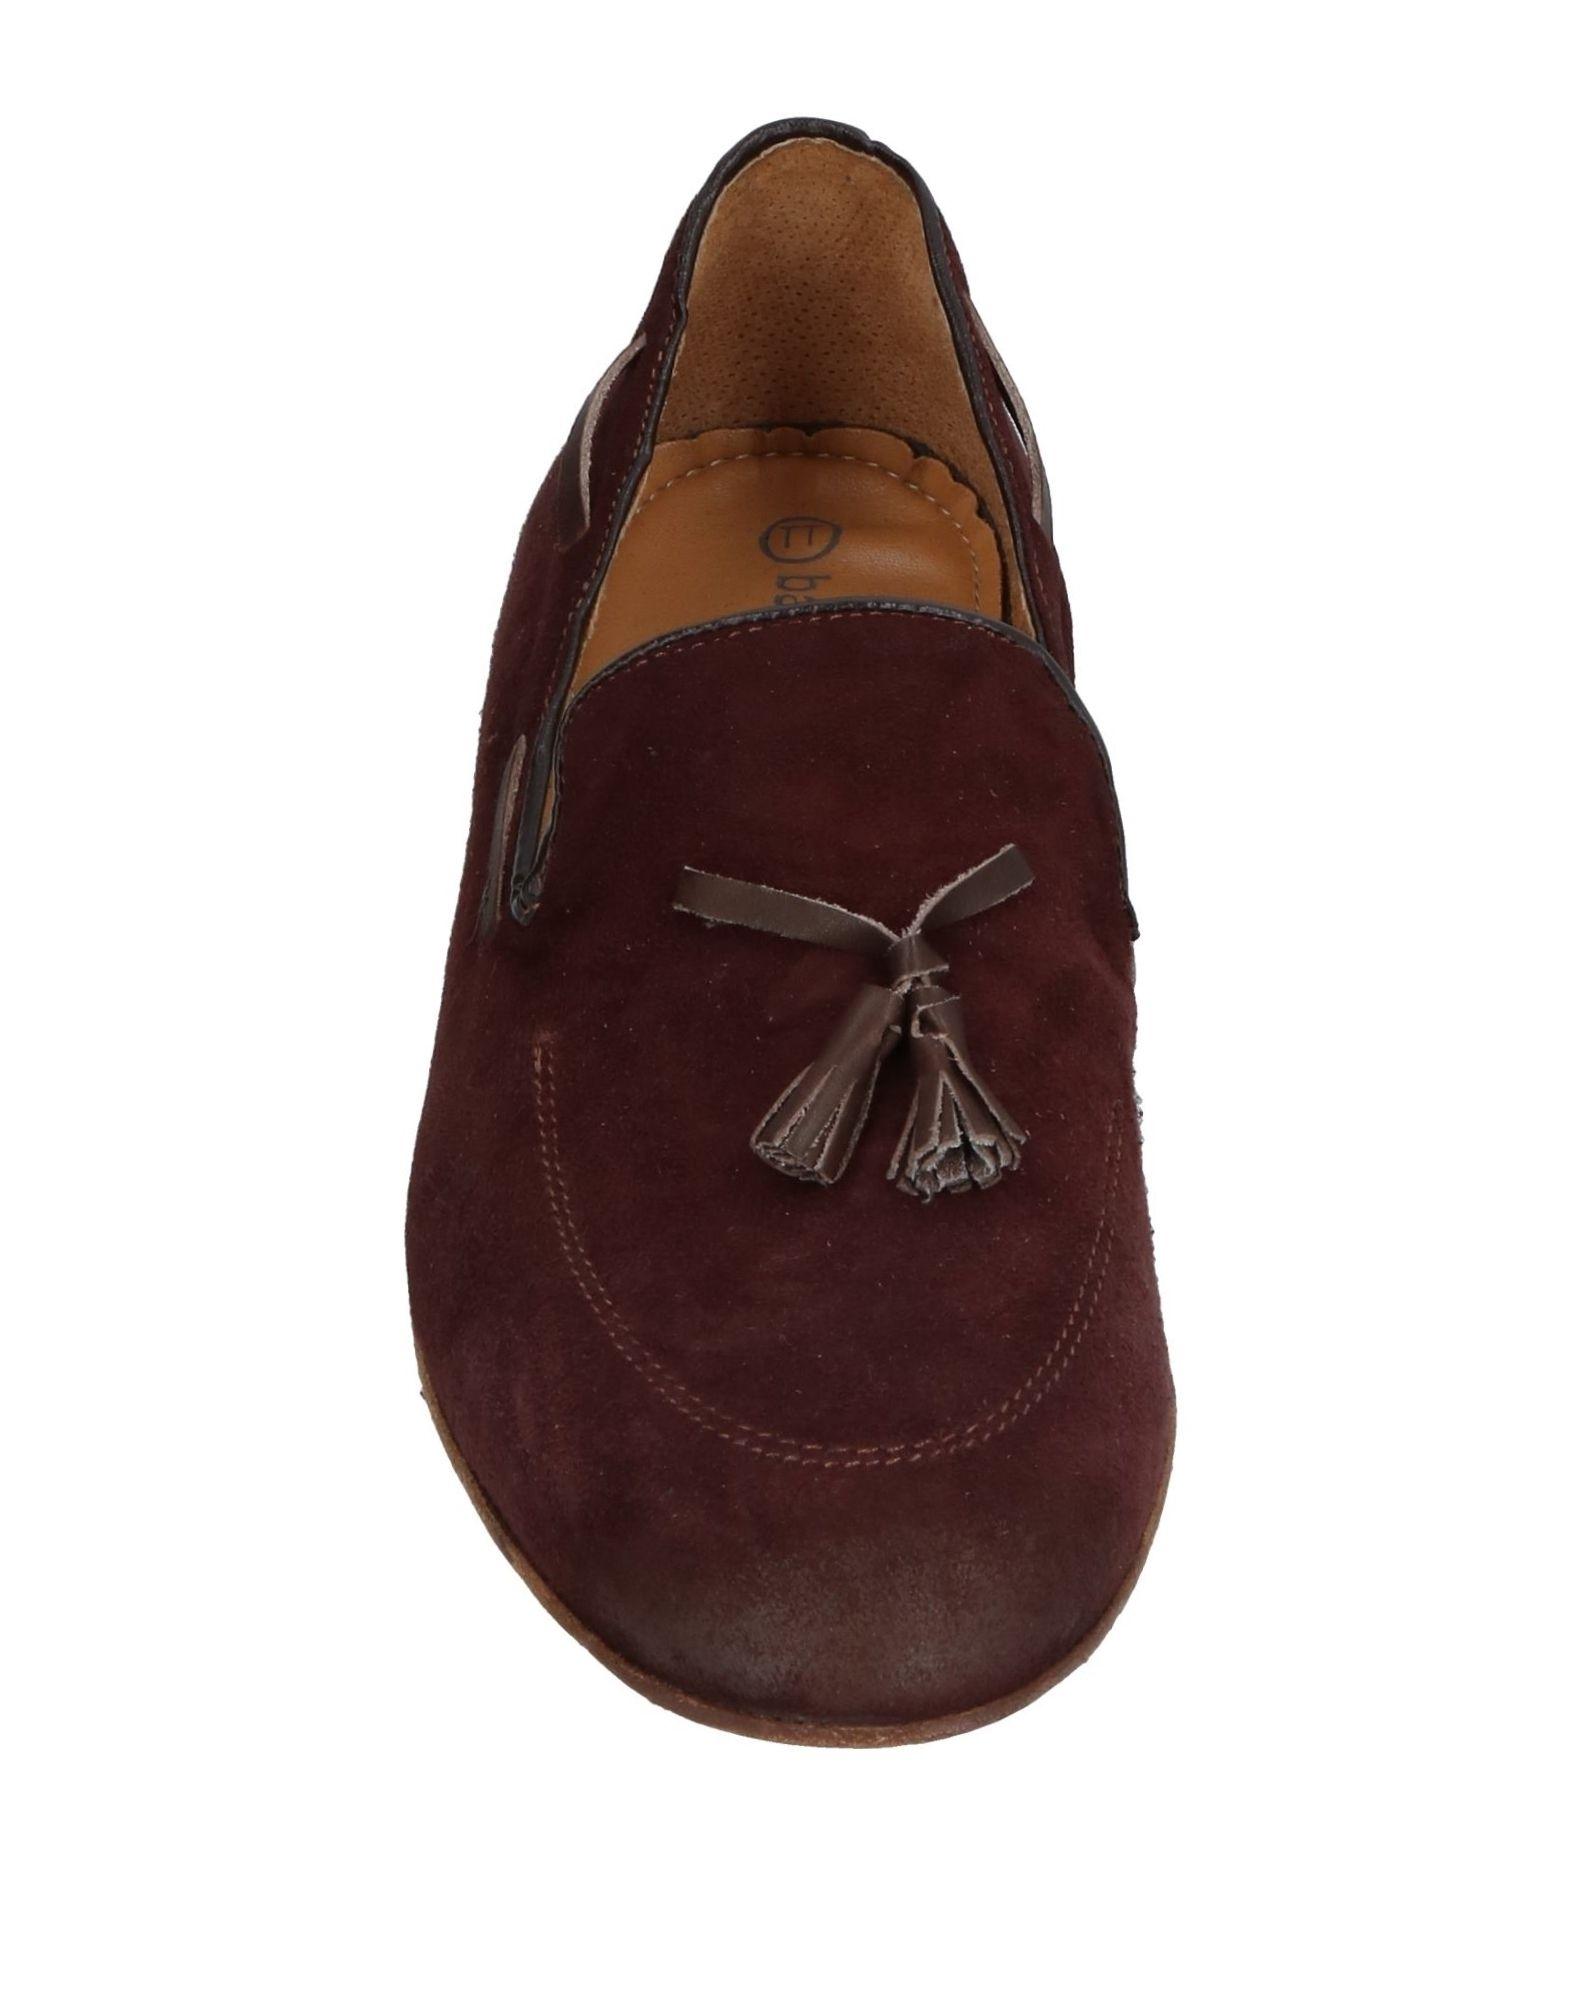 11412868RI Bagatt Mokassins Herren  11412868RI  Heiße Schuhe f3a0ab